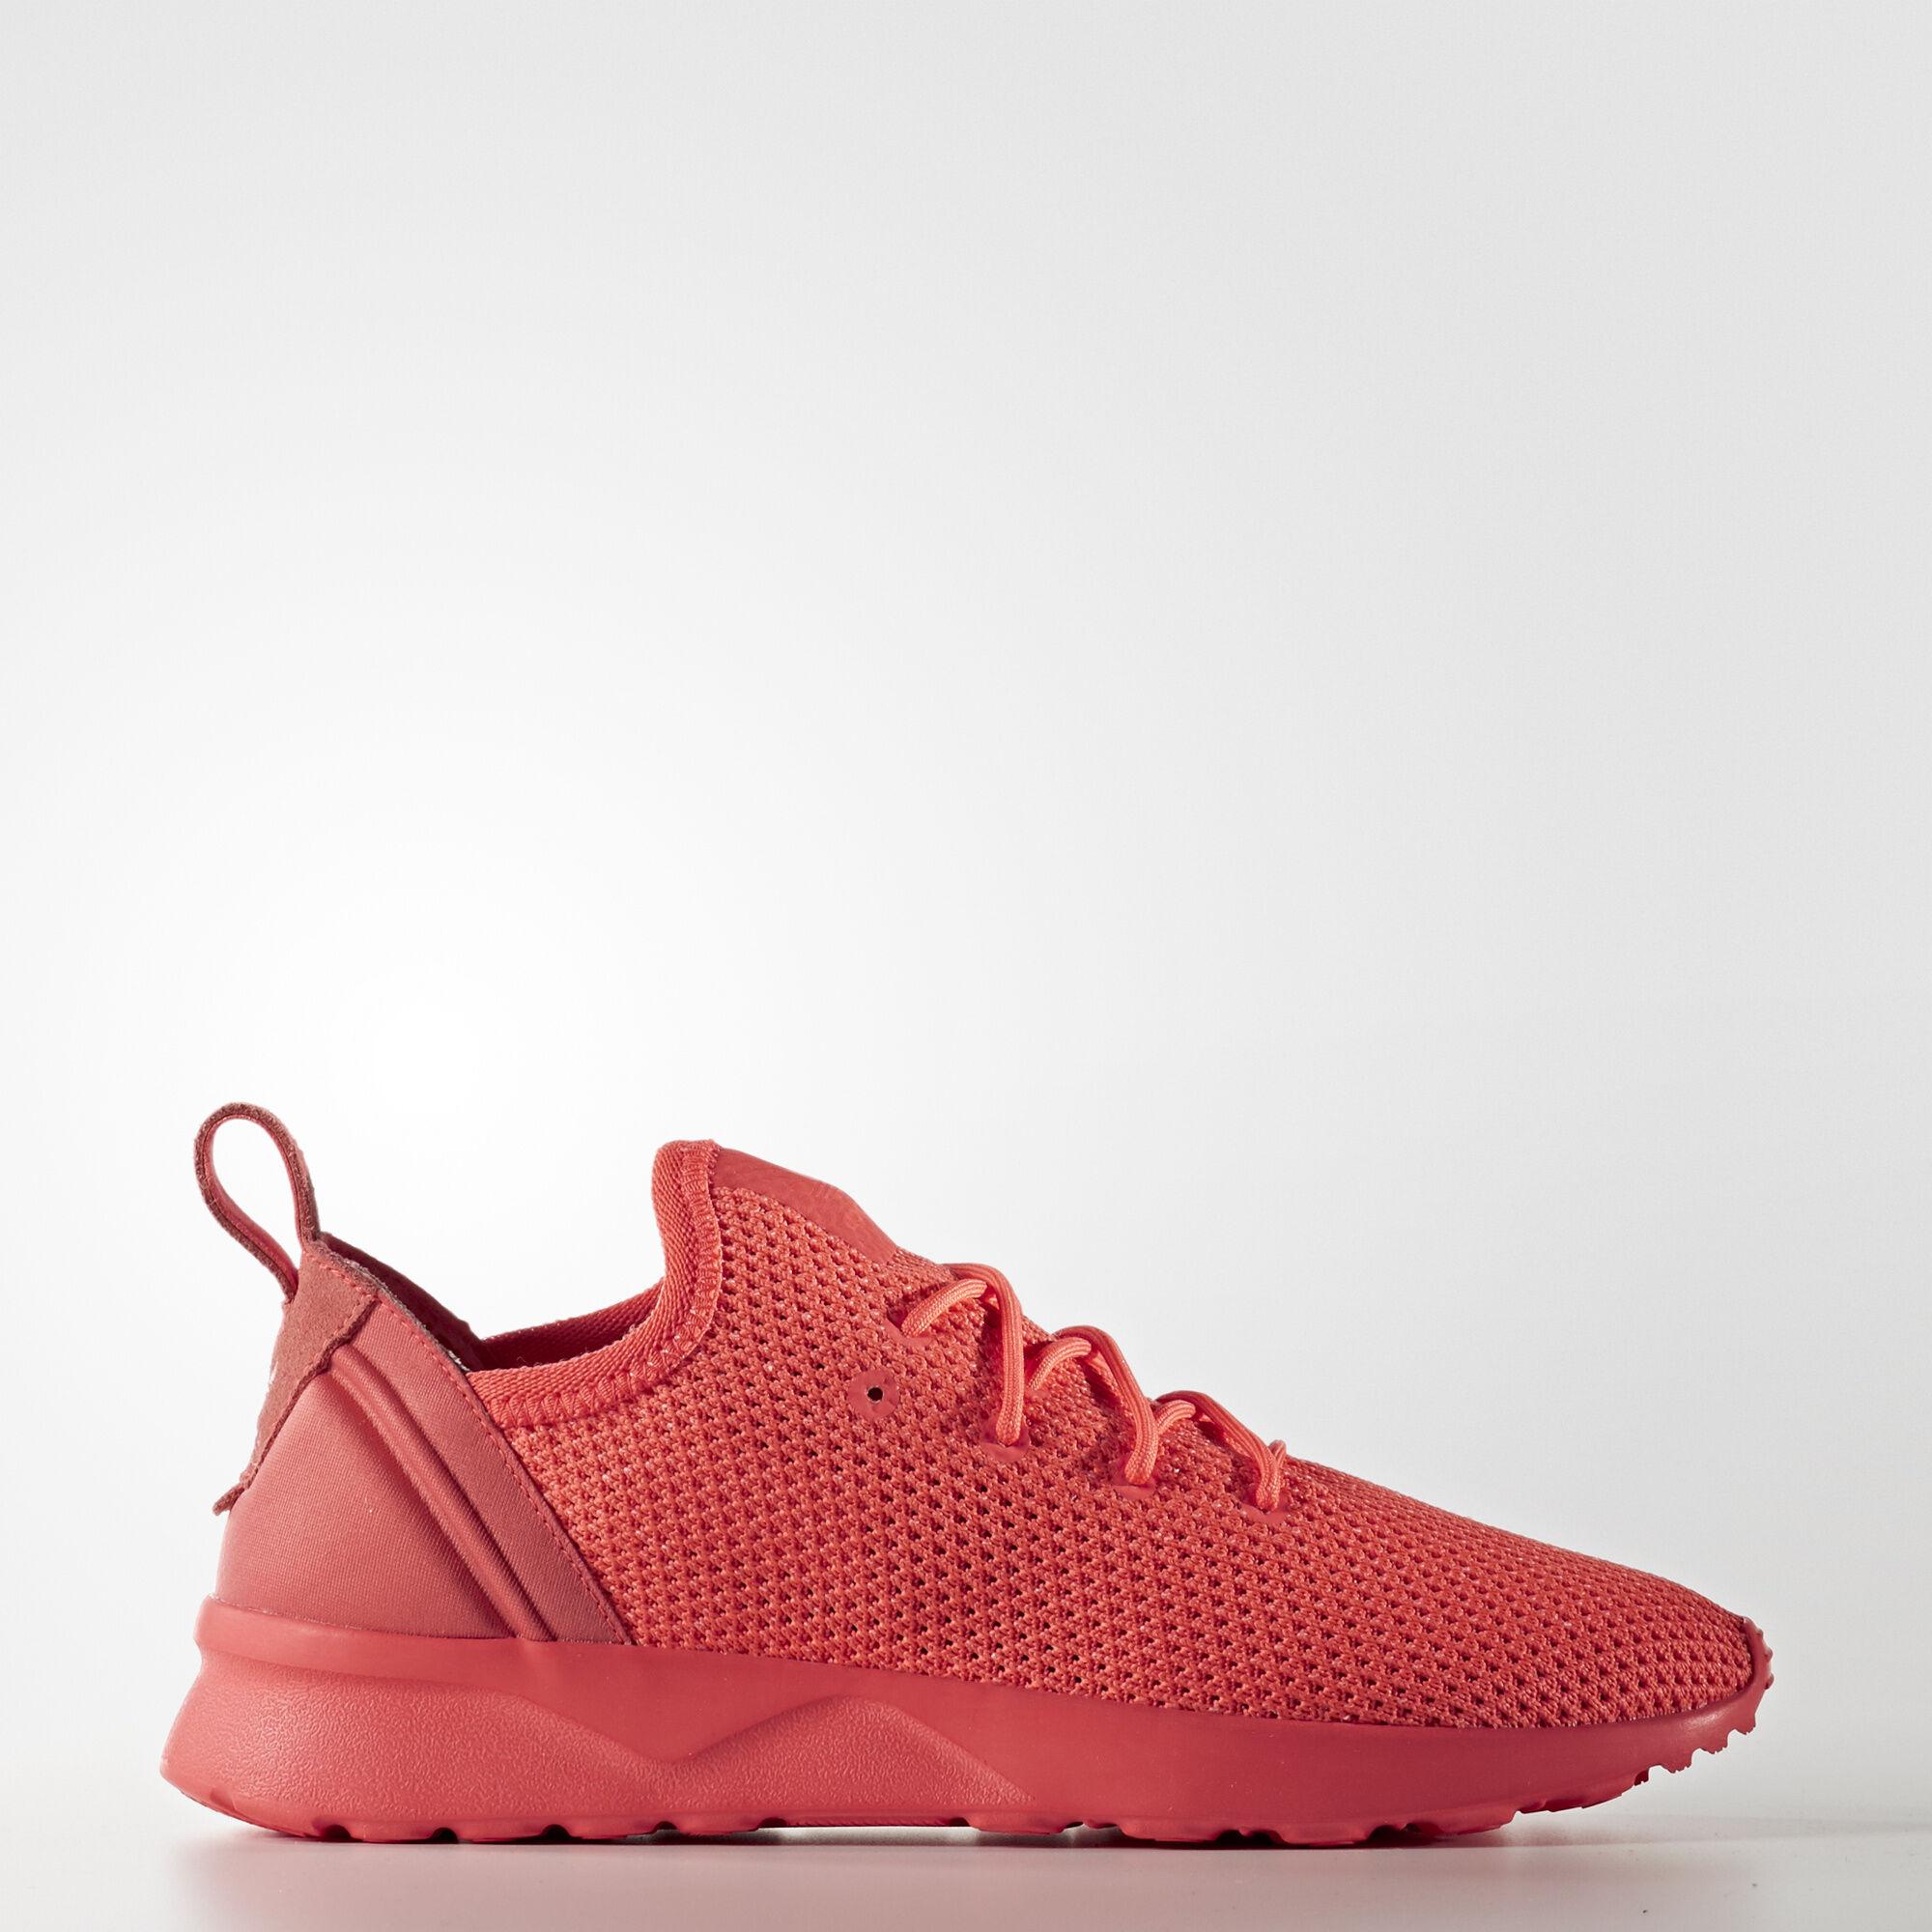 new concept d06ec 13c2a La foto se está cargando Adidas-ZX-Flux-ADV-virtud-Calcetin-W-Mujer-